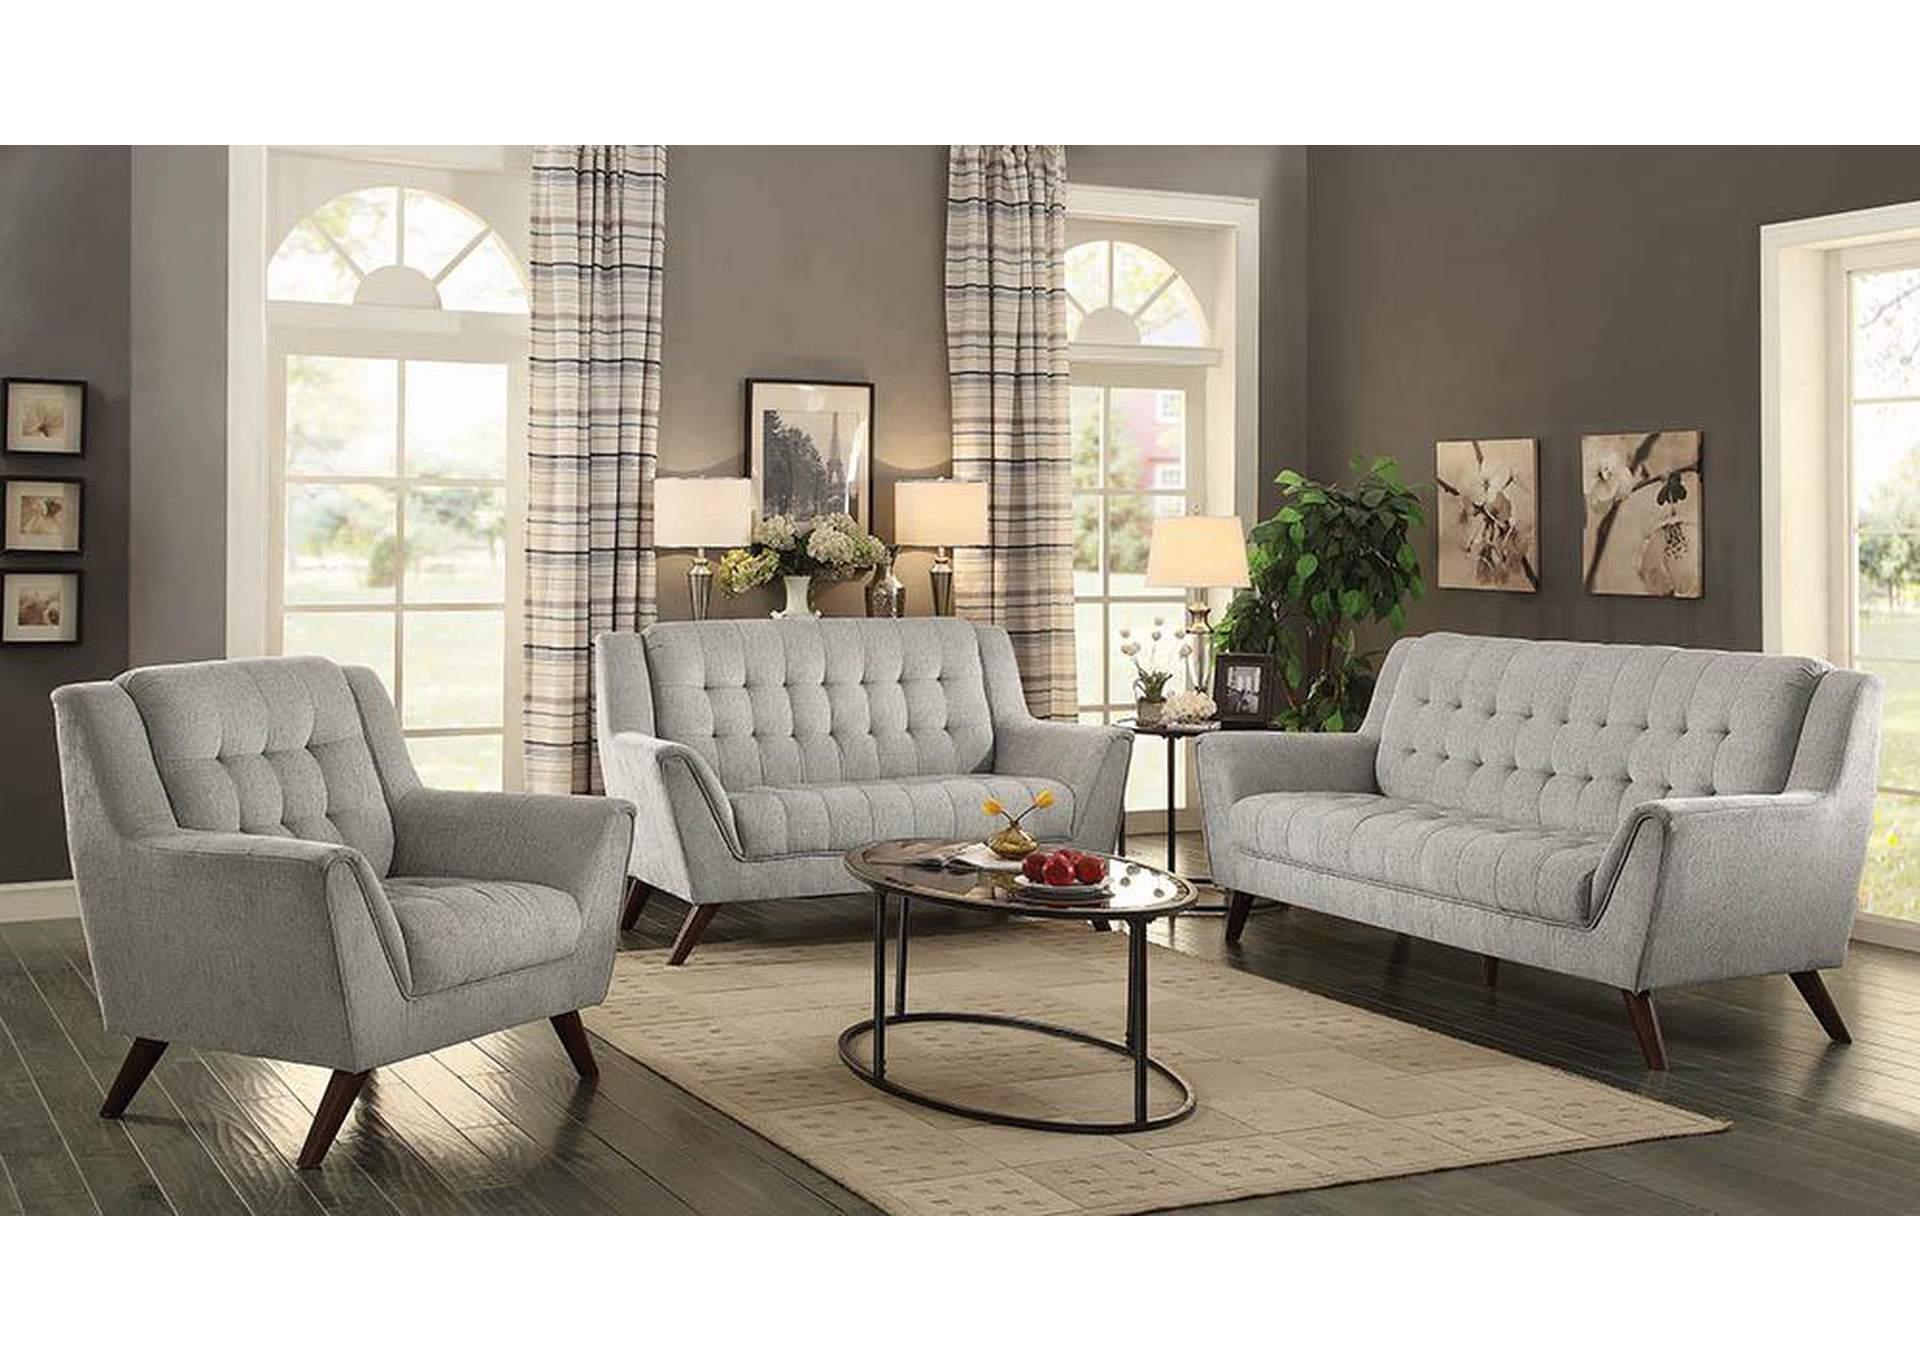 Harlem Furniture Baby Natalia Dove Grey Sofa